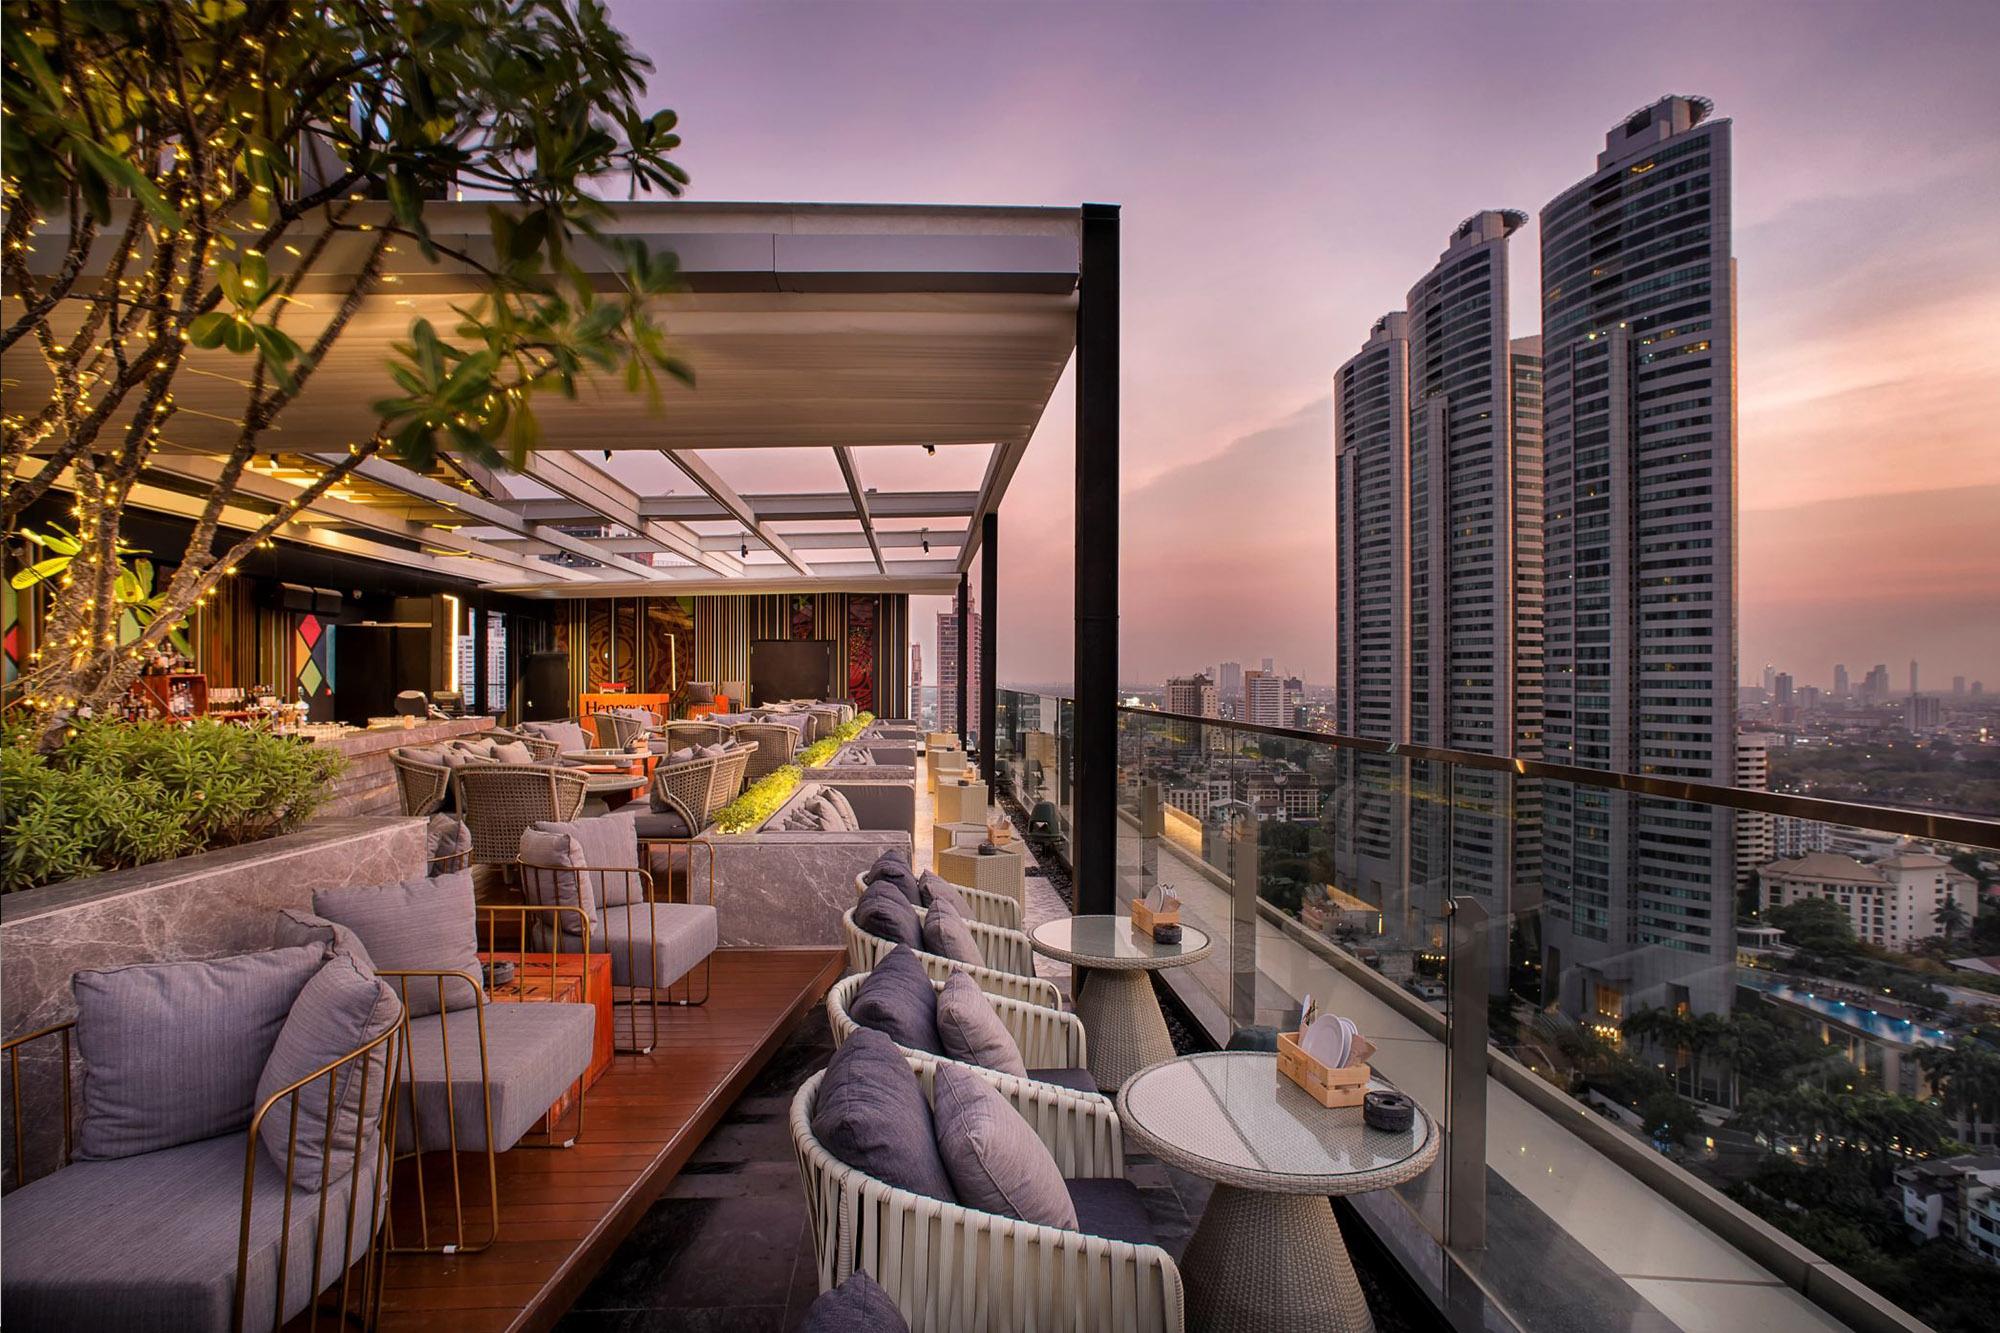 曼谷 Novotel Novotel 酒店 Novotel Novotel Bangkok Novotel Bangkok Sukhumvit 20